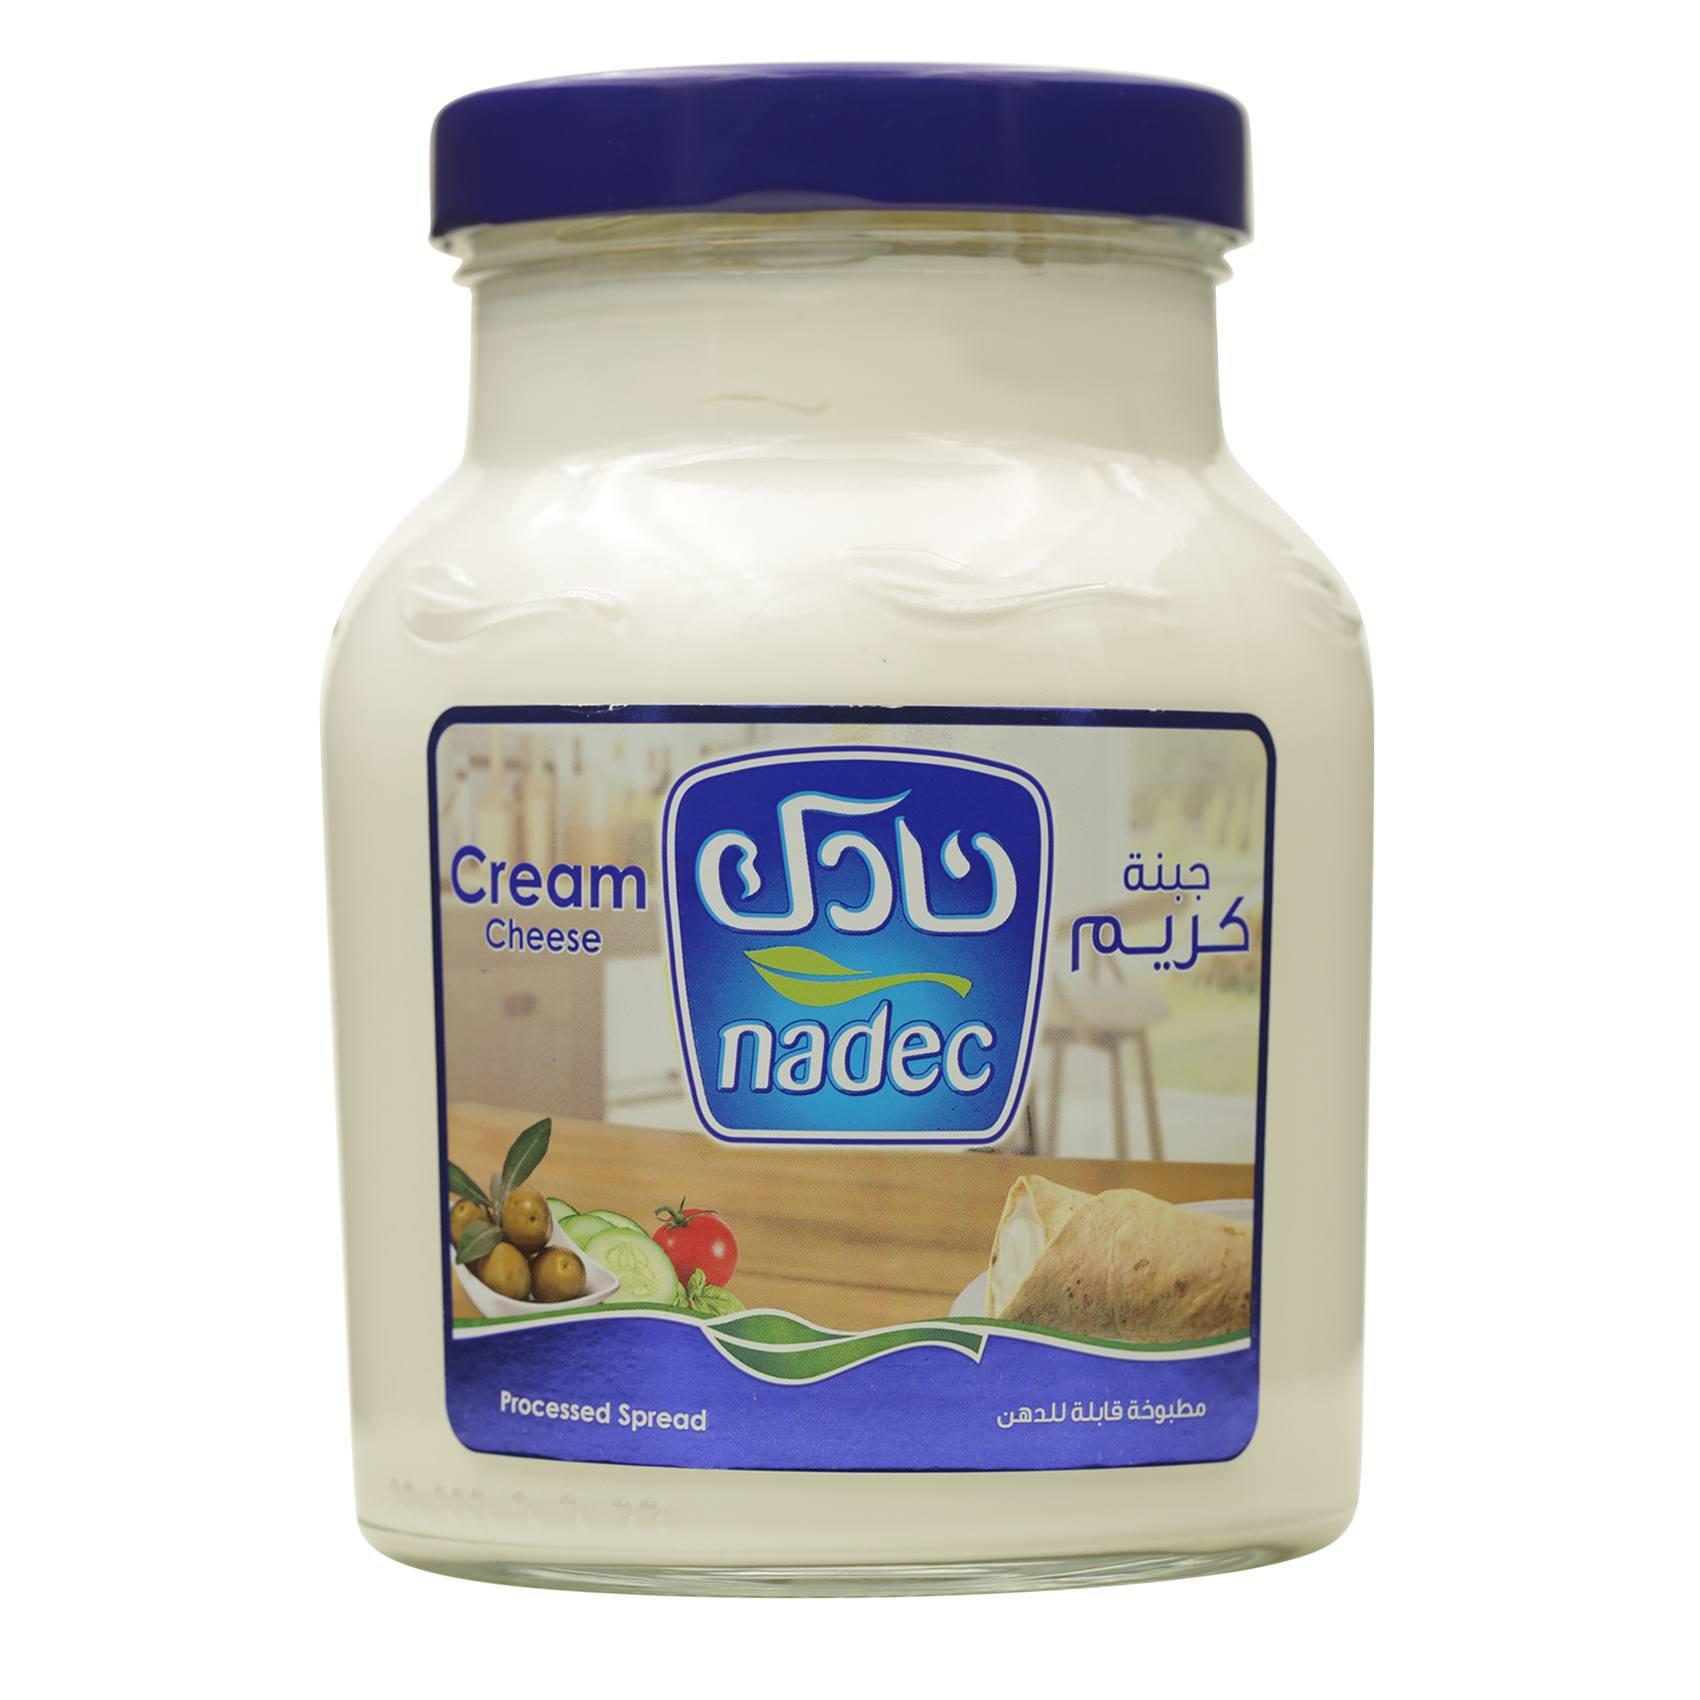 NADEC CHEESE JAR CREAM 910G